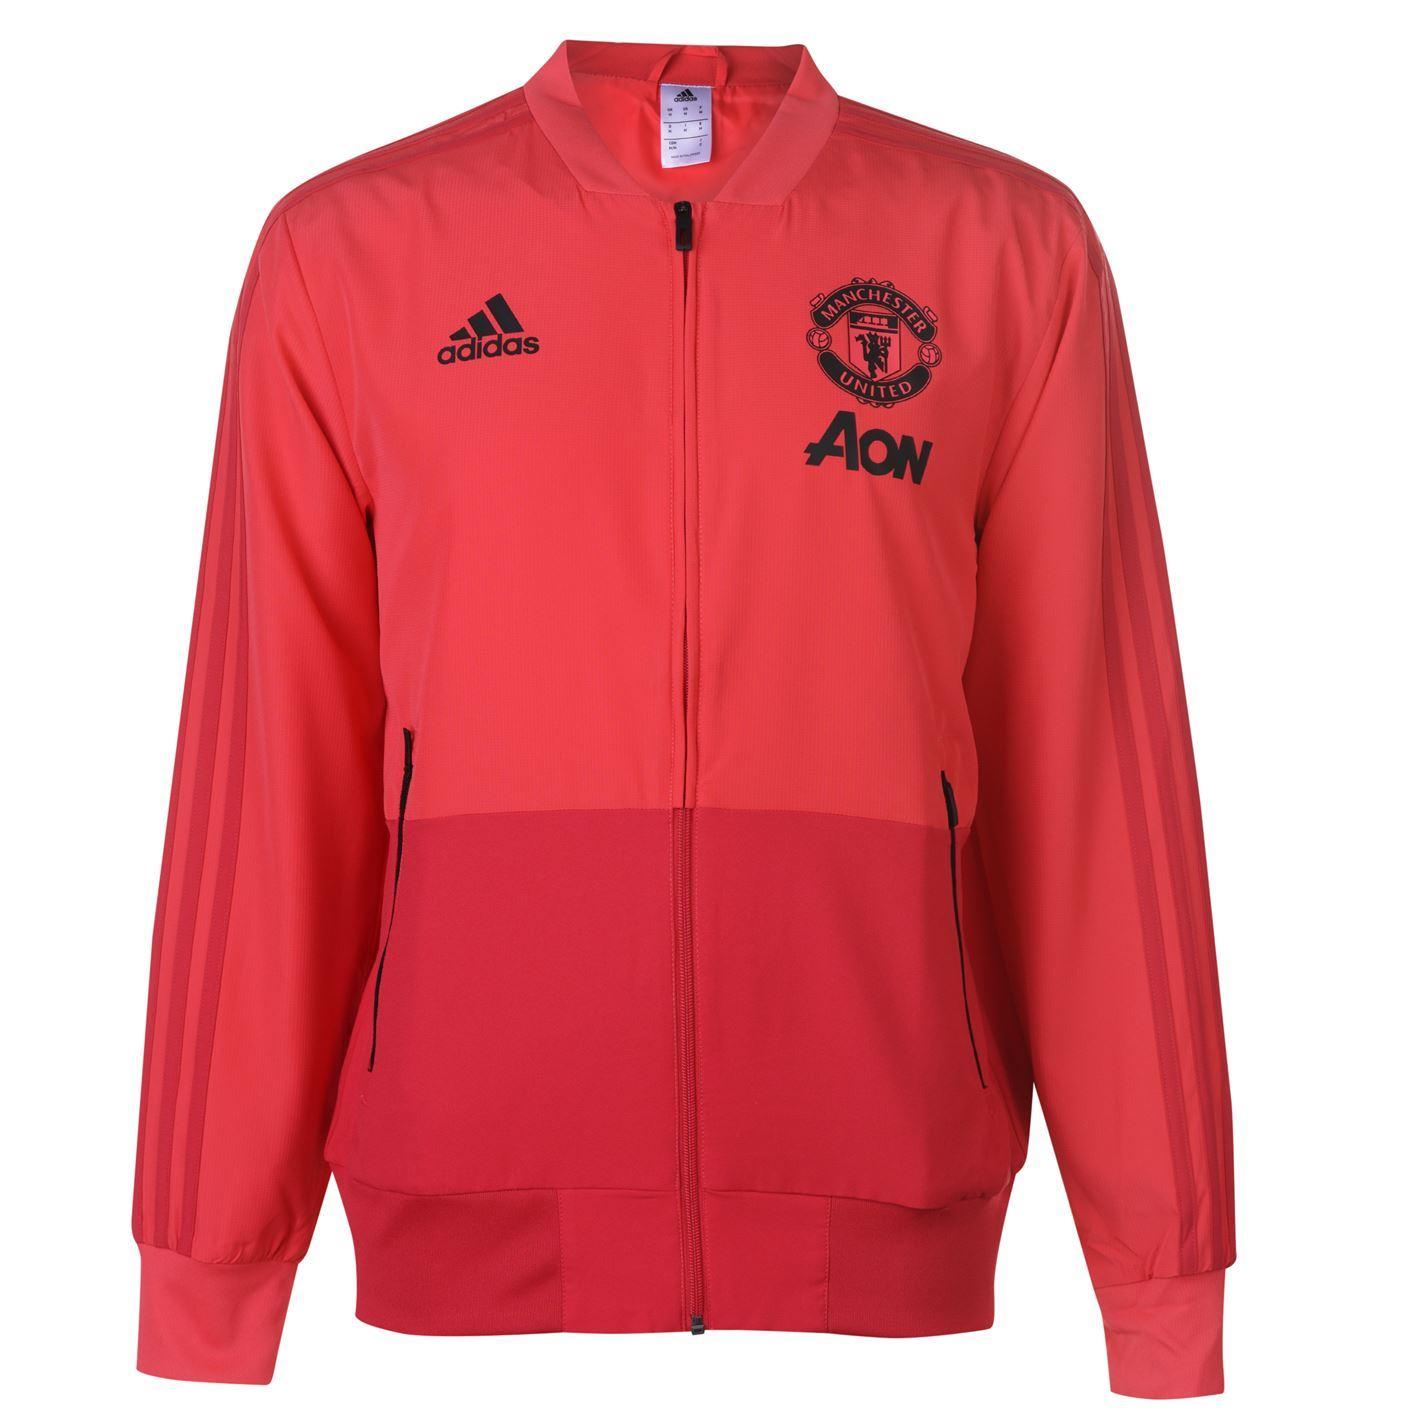 3eb5e84f1 adidas Manchester United Pre Match Jacket 2018 19 Mens Football ...